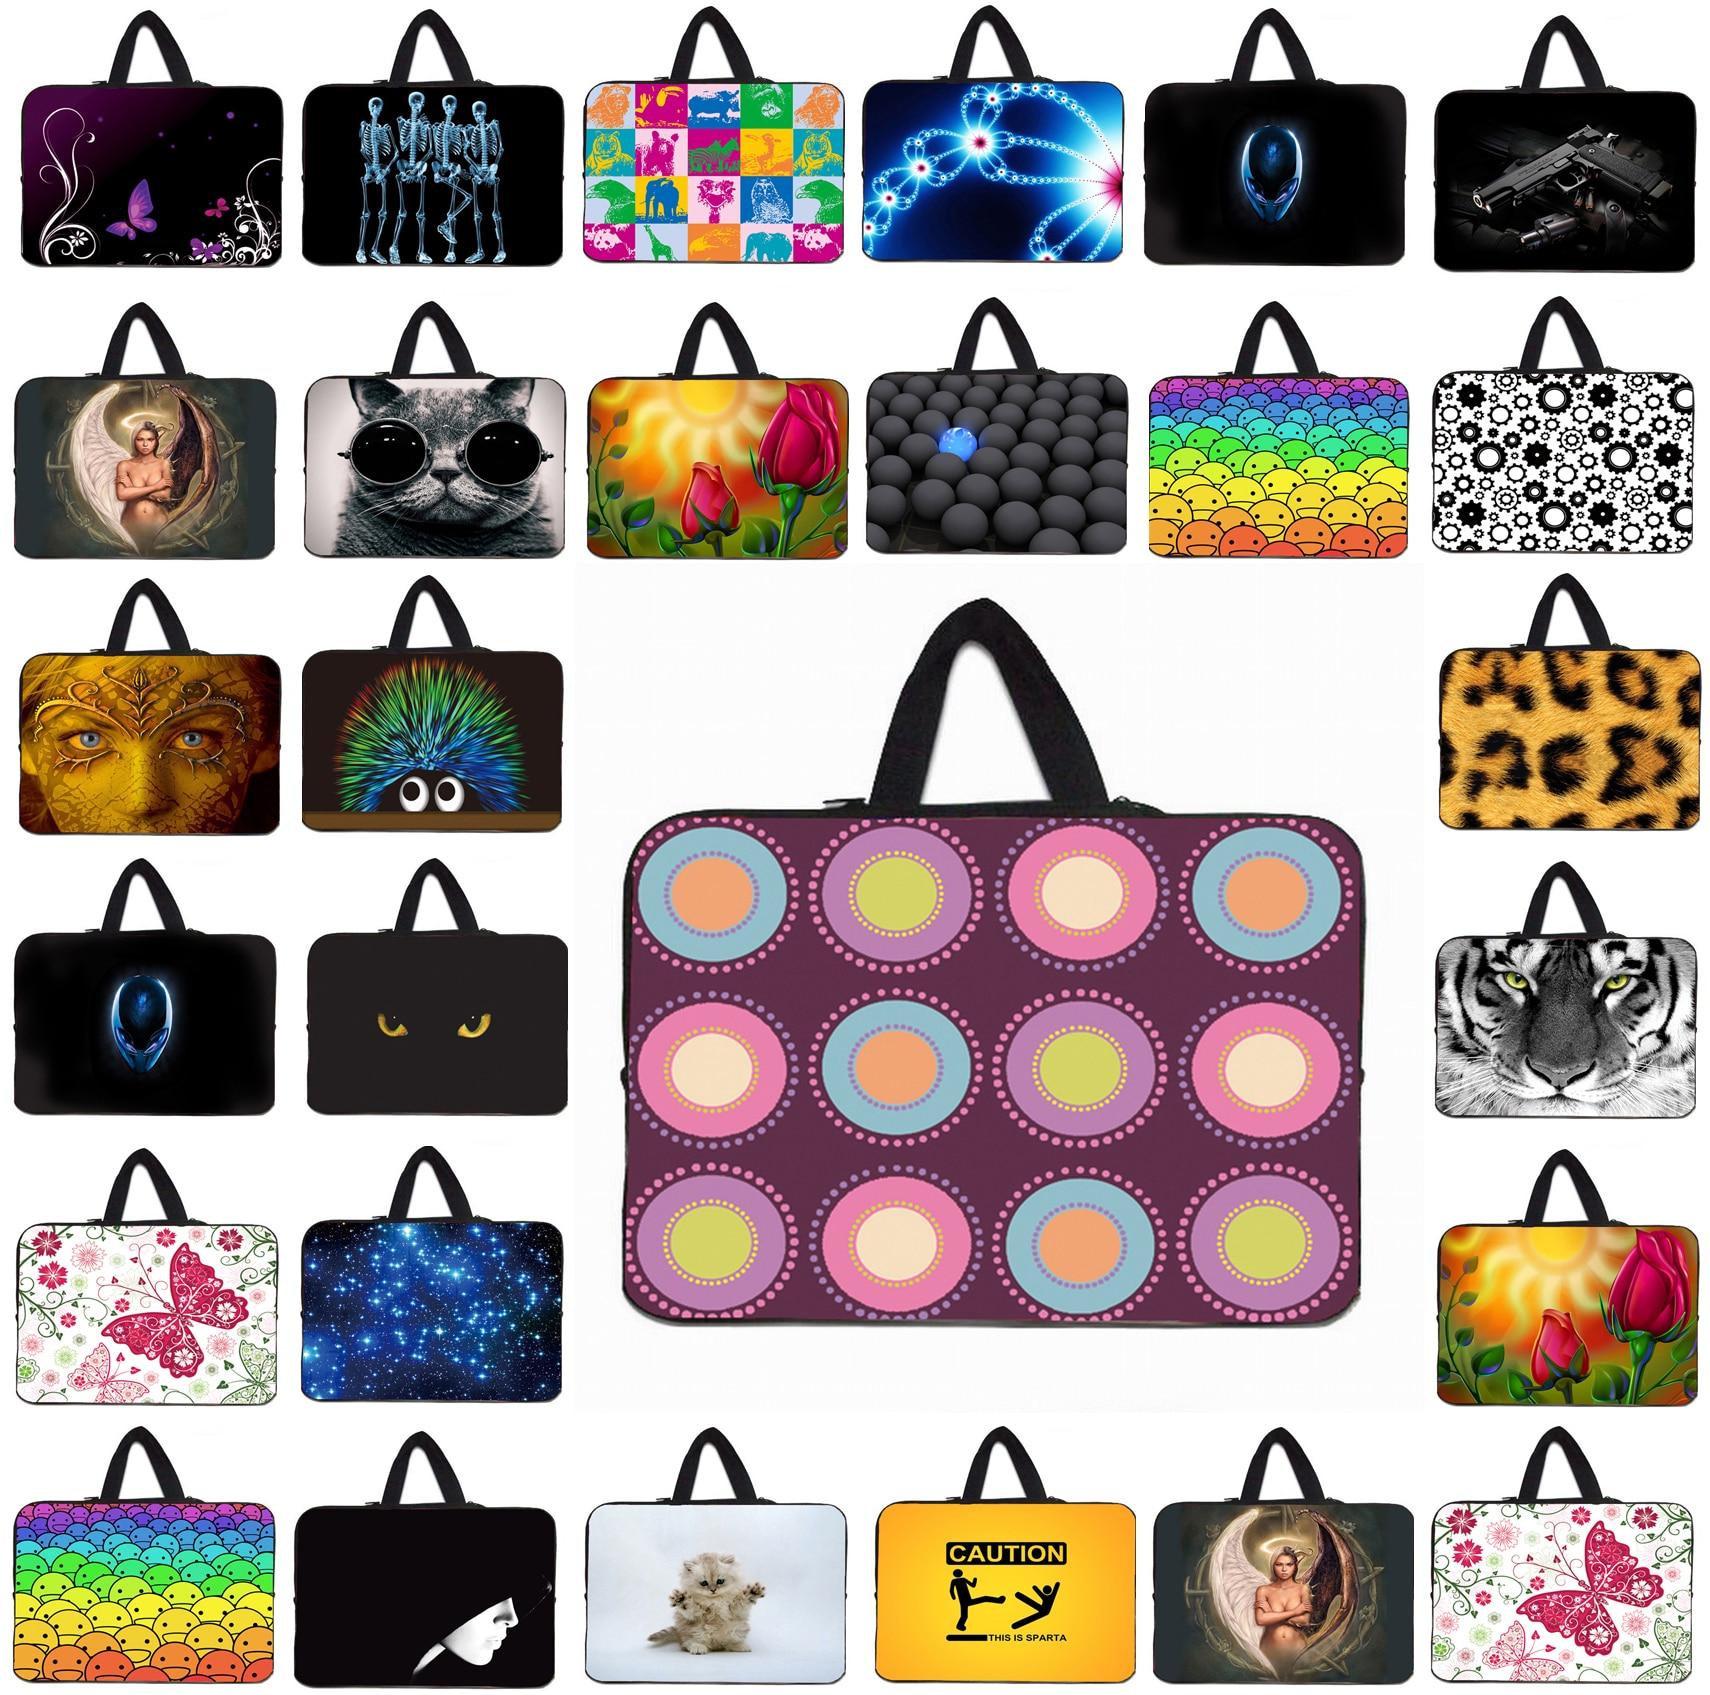 "Viviration Fashion Neoprene Laptop Bag 10.1 12 13.3 14 15 15.6 17 inch Sleeve Case 13"" 10"" Notebook Bag Chuwi Hi10 Huawei PC"